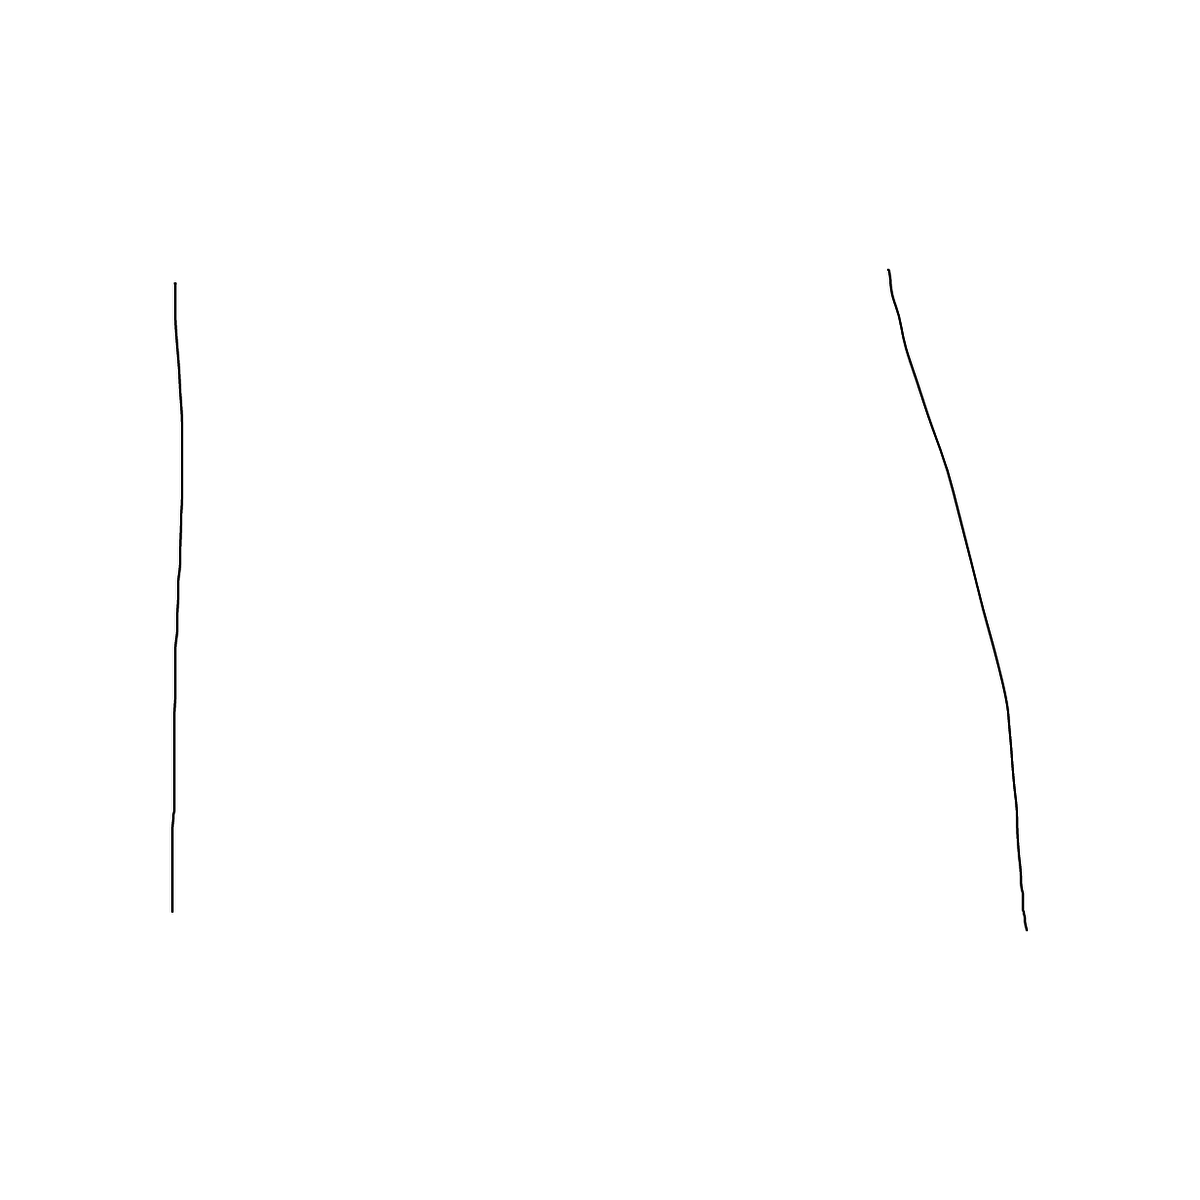 BAAAM drawing#19575 lat:40.4807548522949200lng: -74.0054855346679700